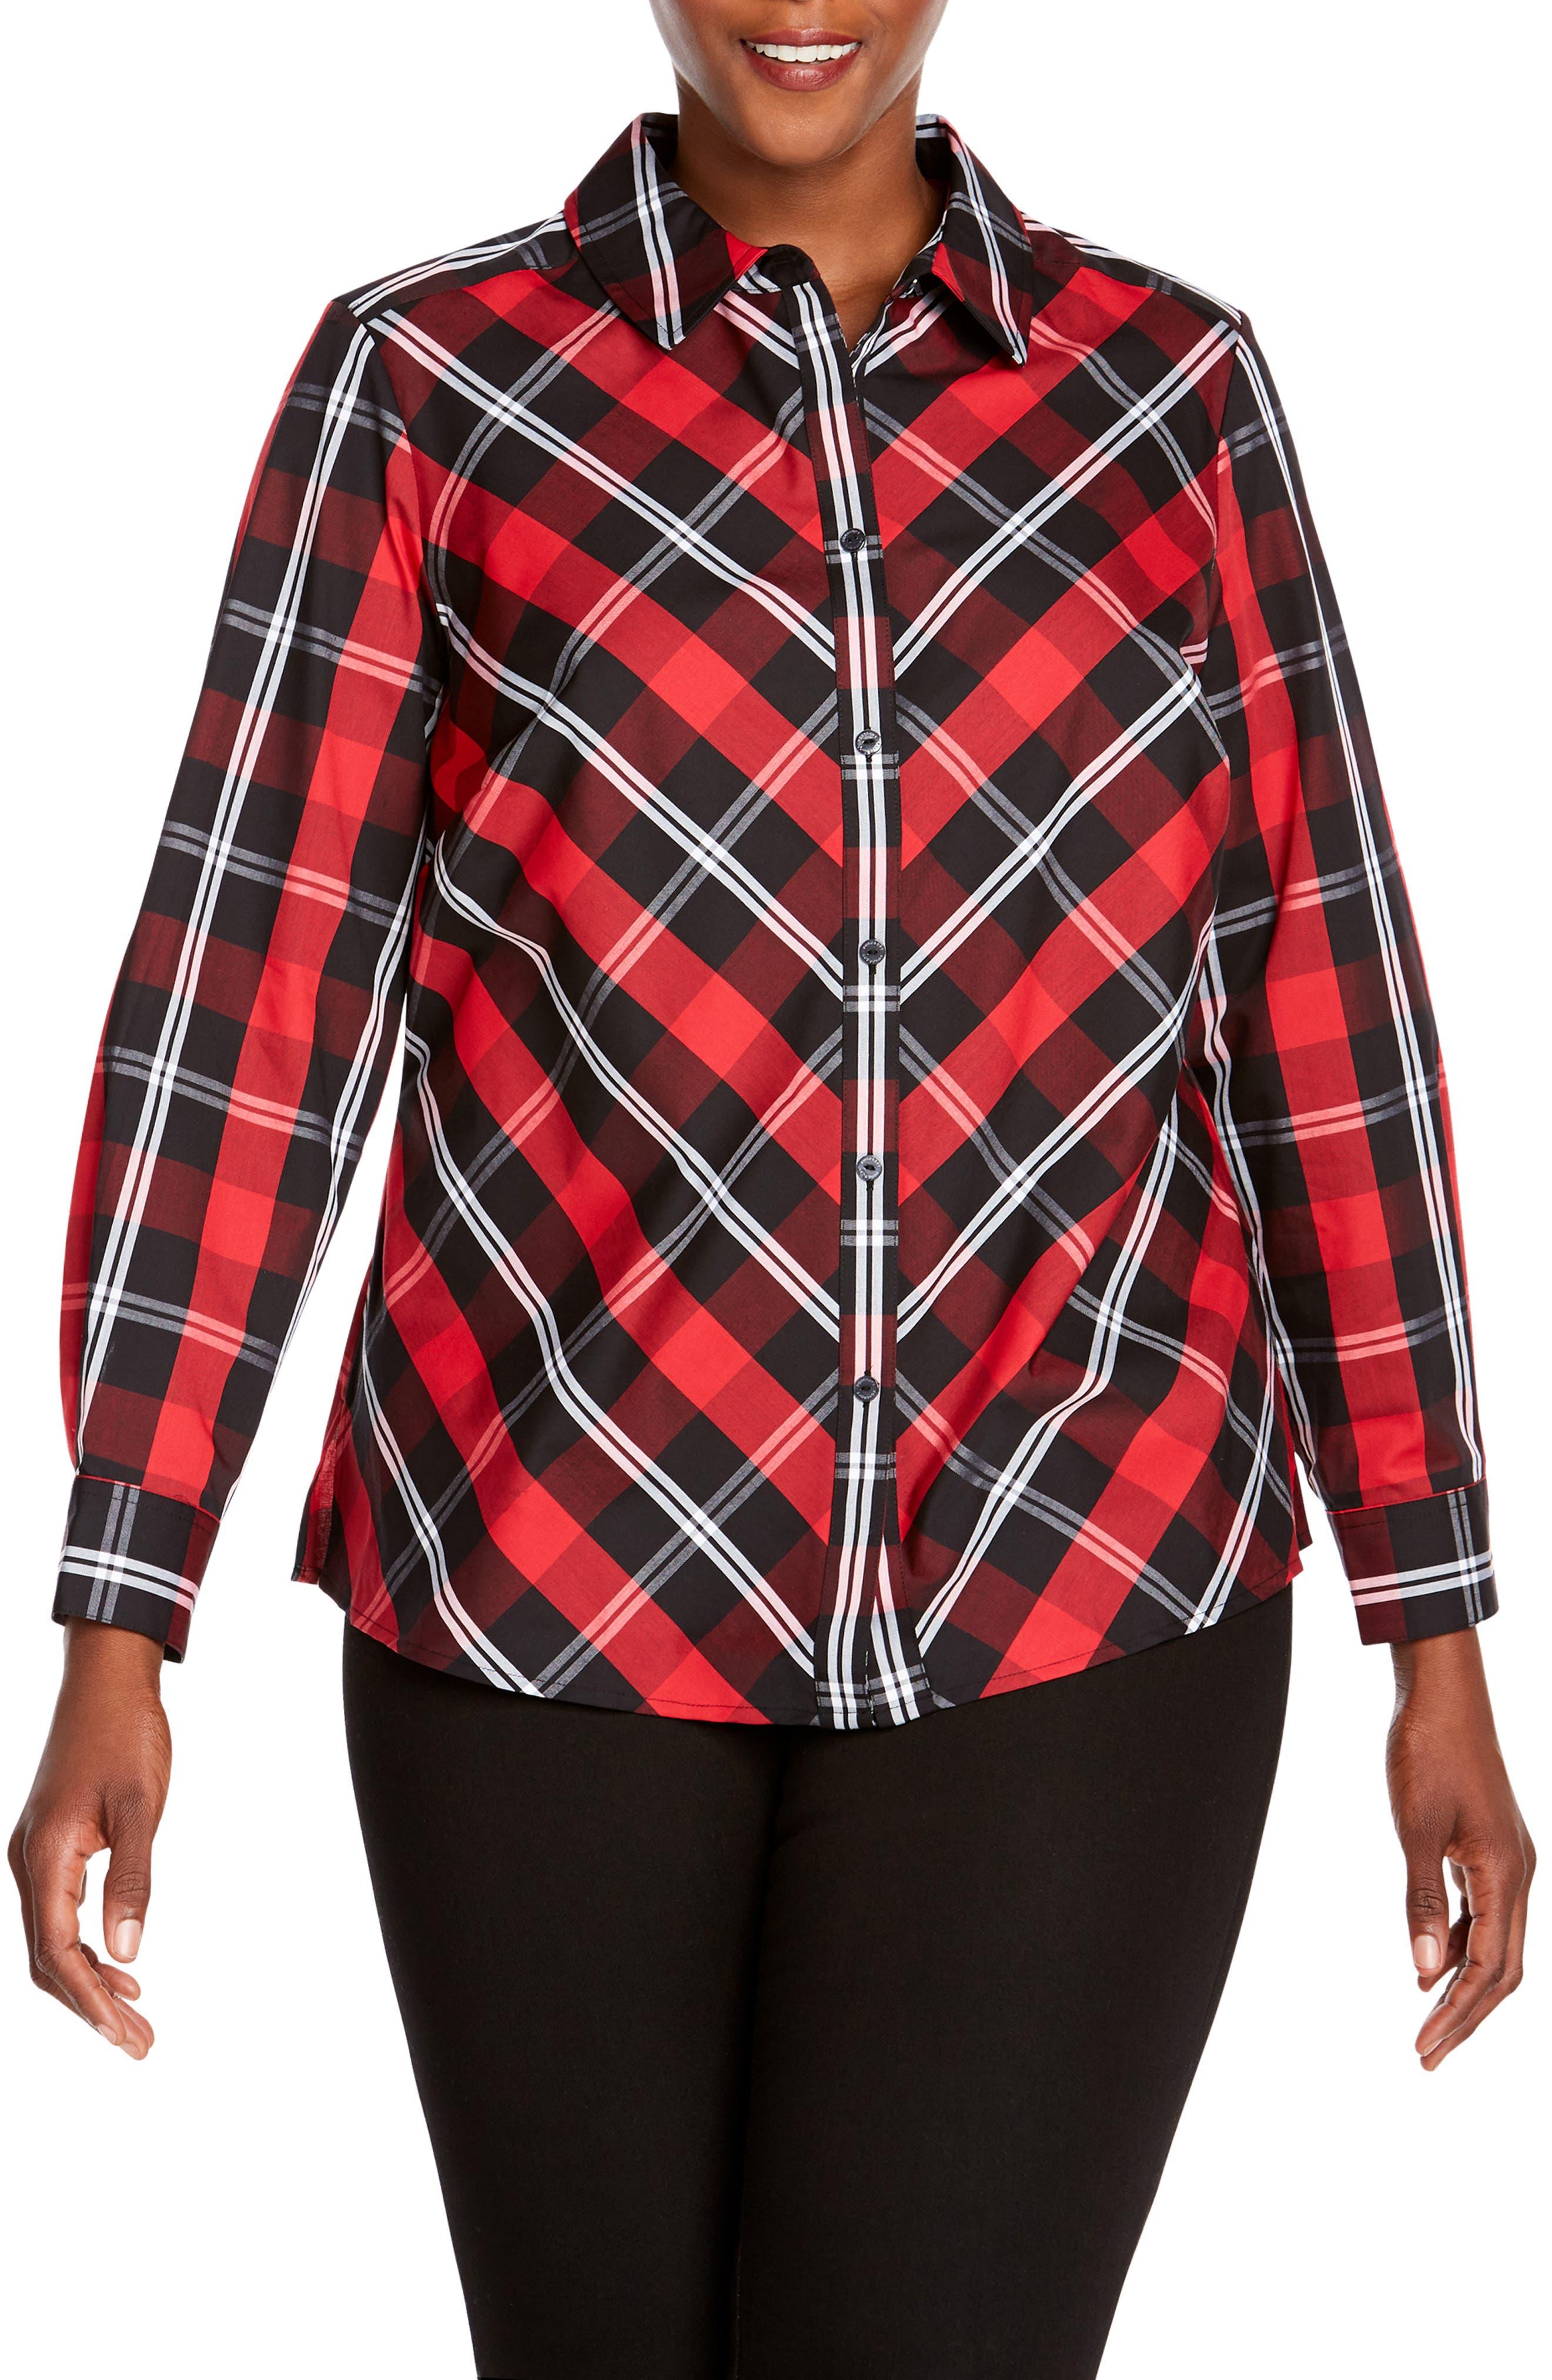 Tina Mackenzie Tartan Plaid Shirt,                         Main,                         color, BLACK/ RED